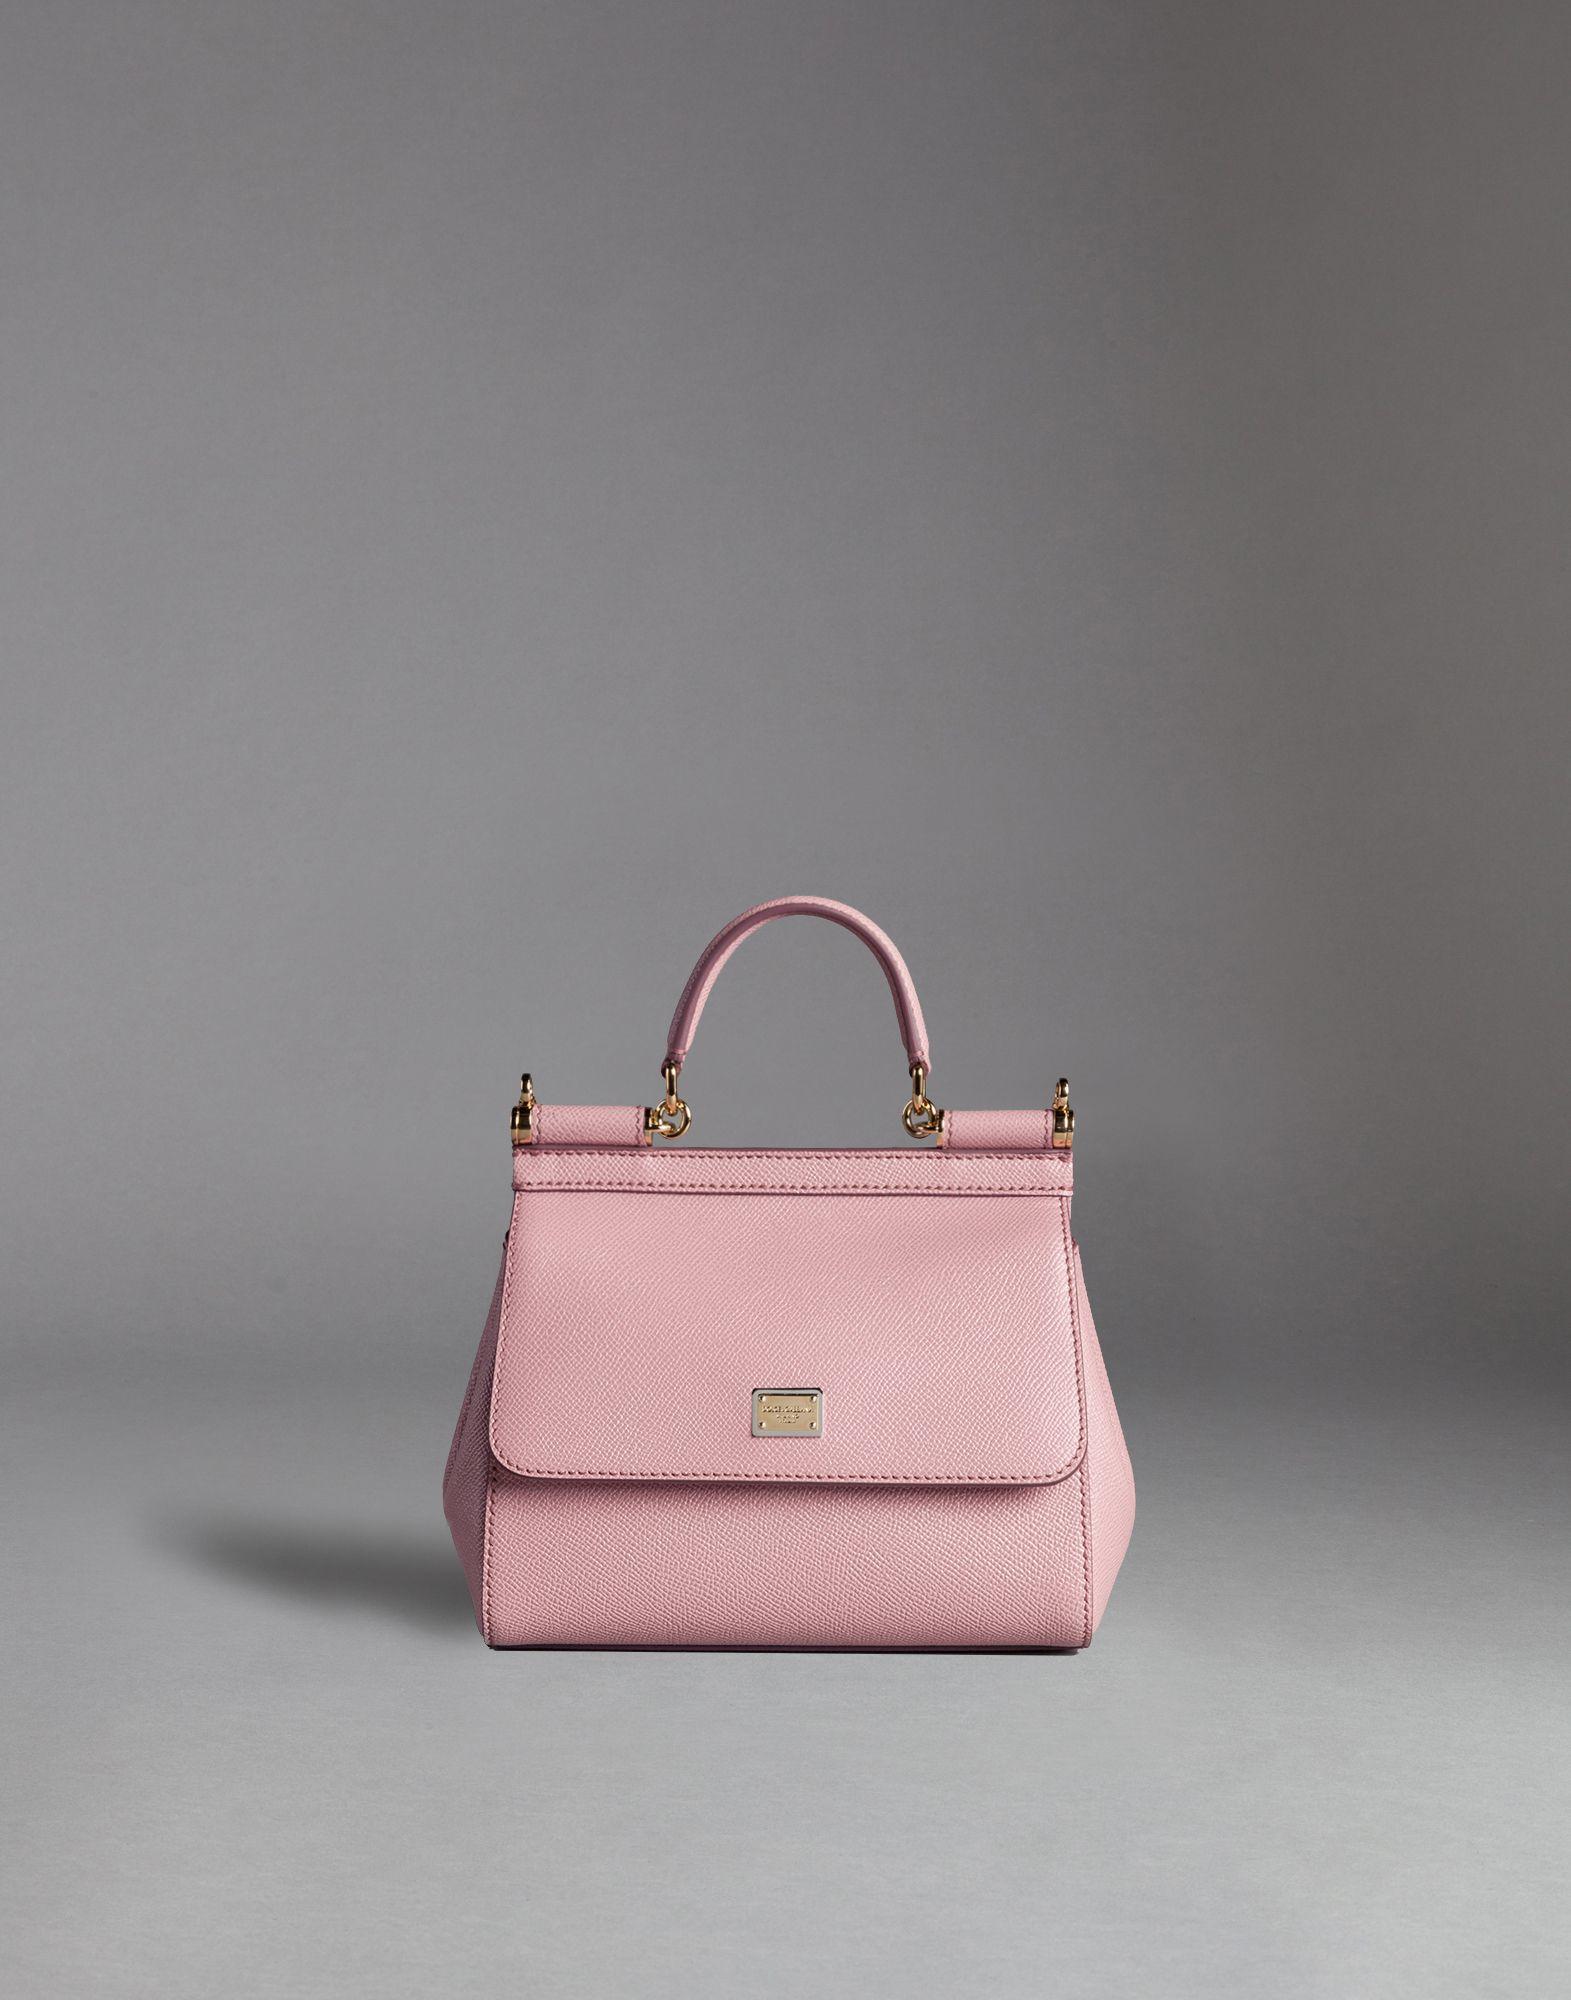 Lyst - Dolce   Gabbana Sicily Mini Dauphine-Print Shoulder Bag in Pink 37eaf5f5803b5